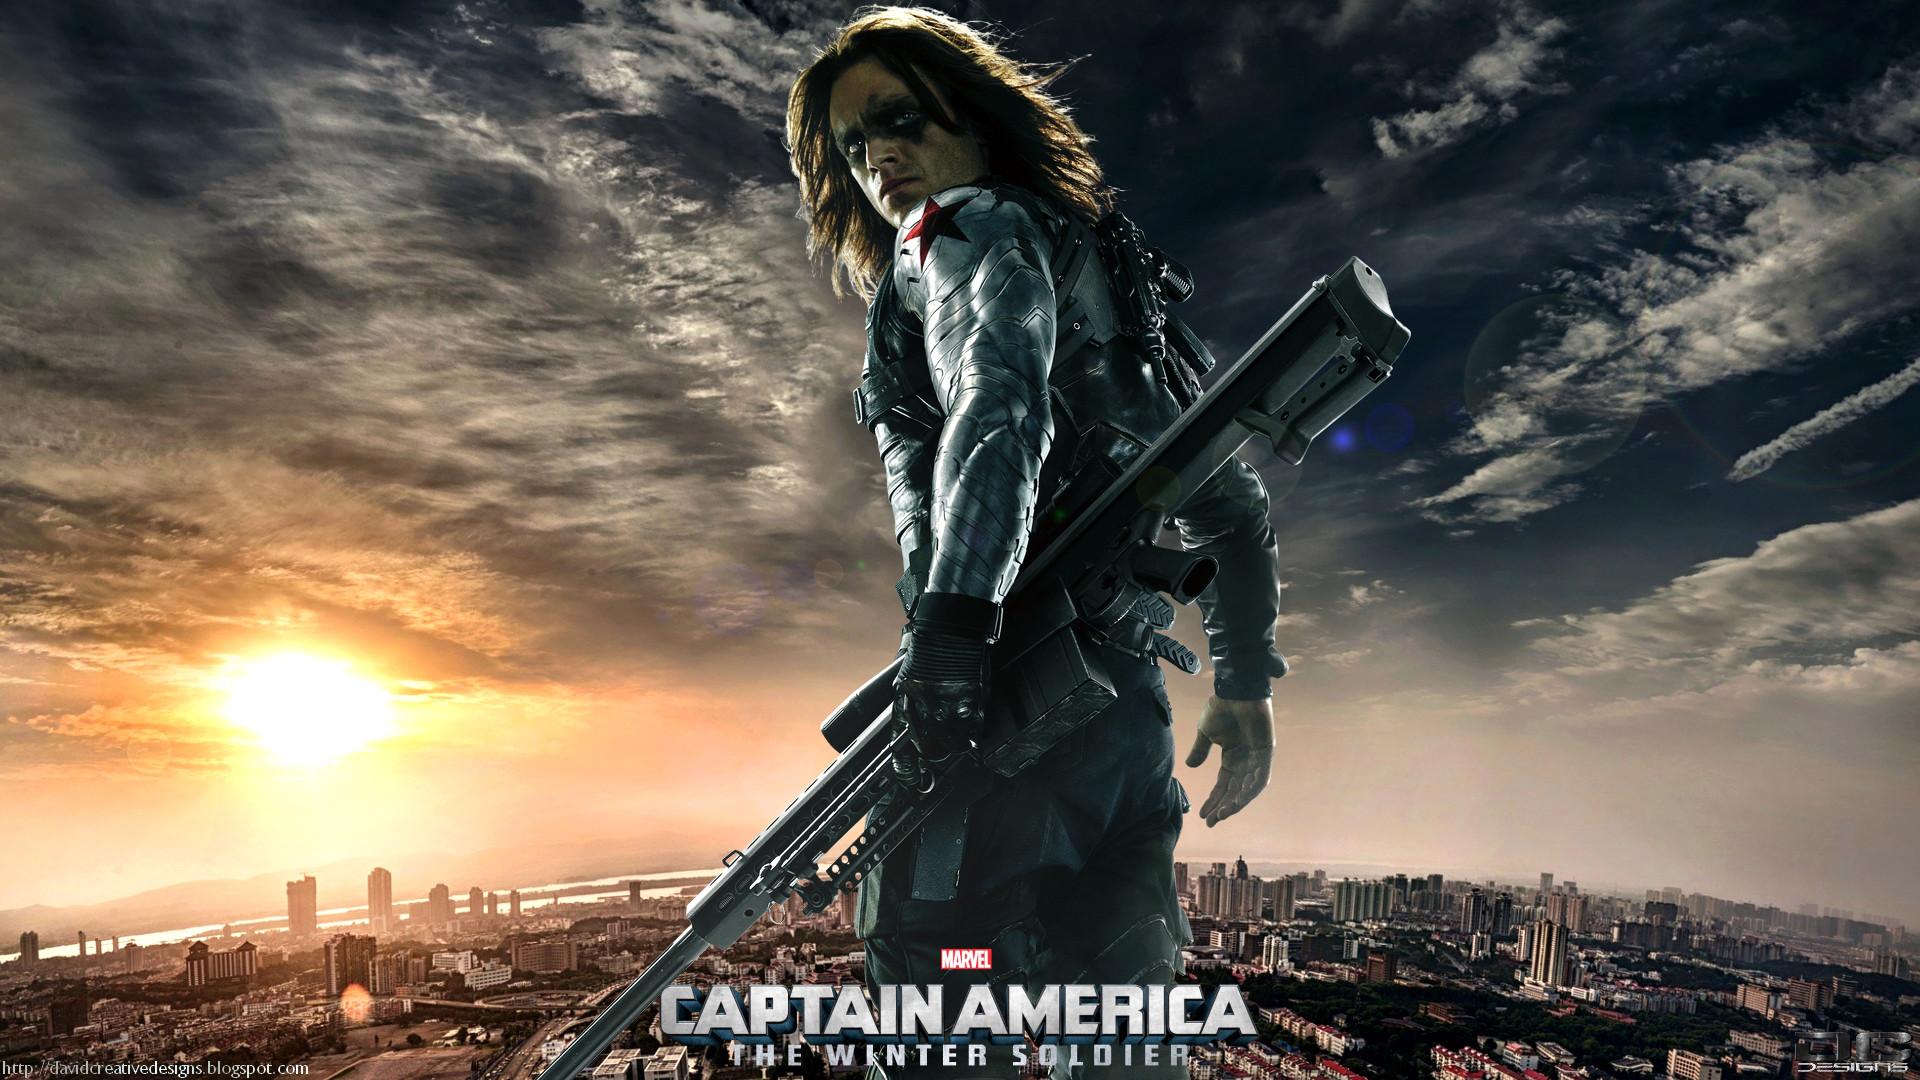 Captain America HD desktop wallpaper Widescreen Fullscreen